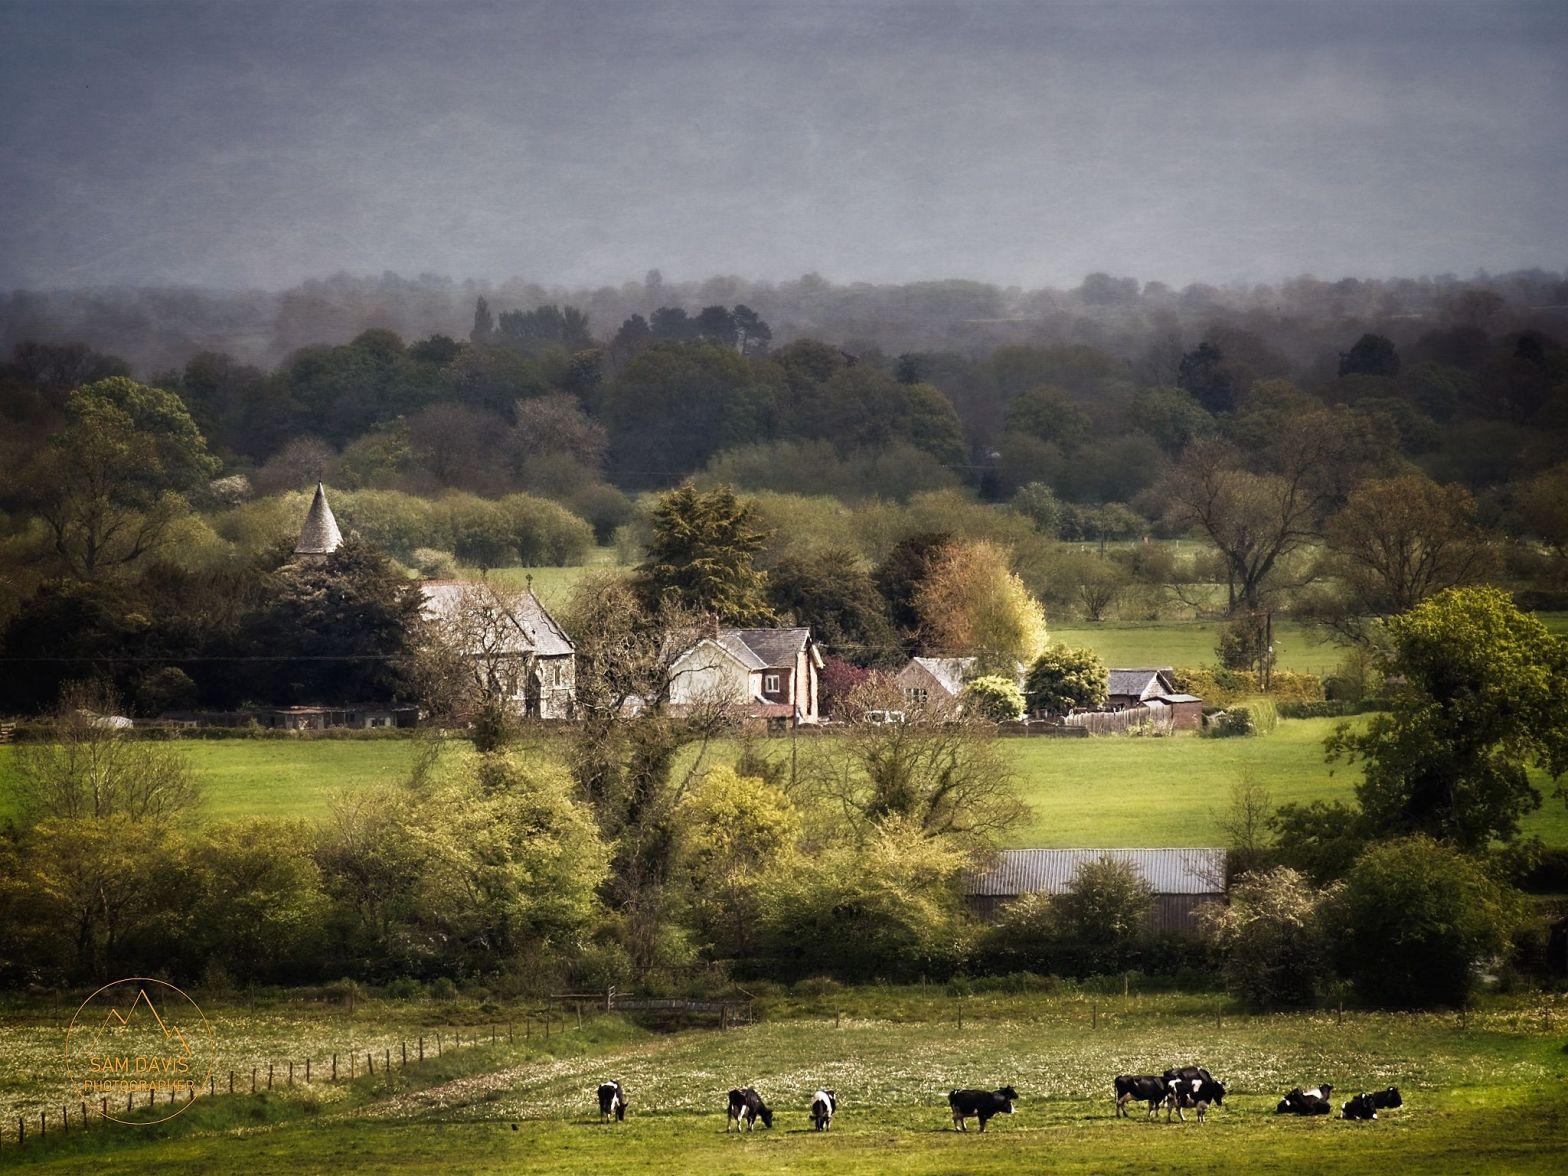 Llandysilio Church and surrounding fields, Four Crosses, Powys, UK. Sam Davis Photographer. www.samsphotogallery.com